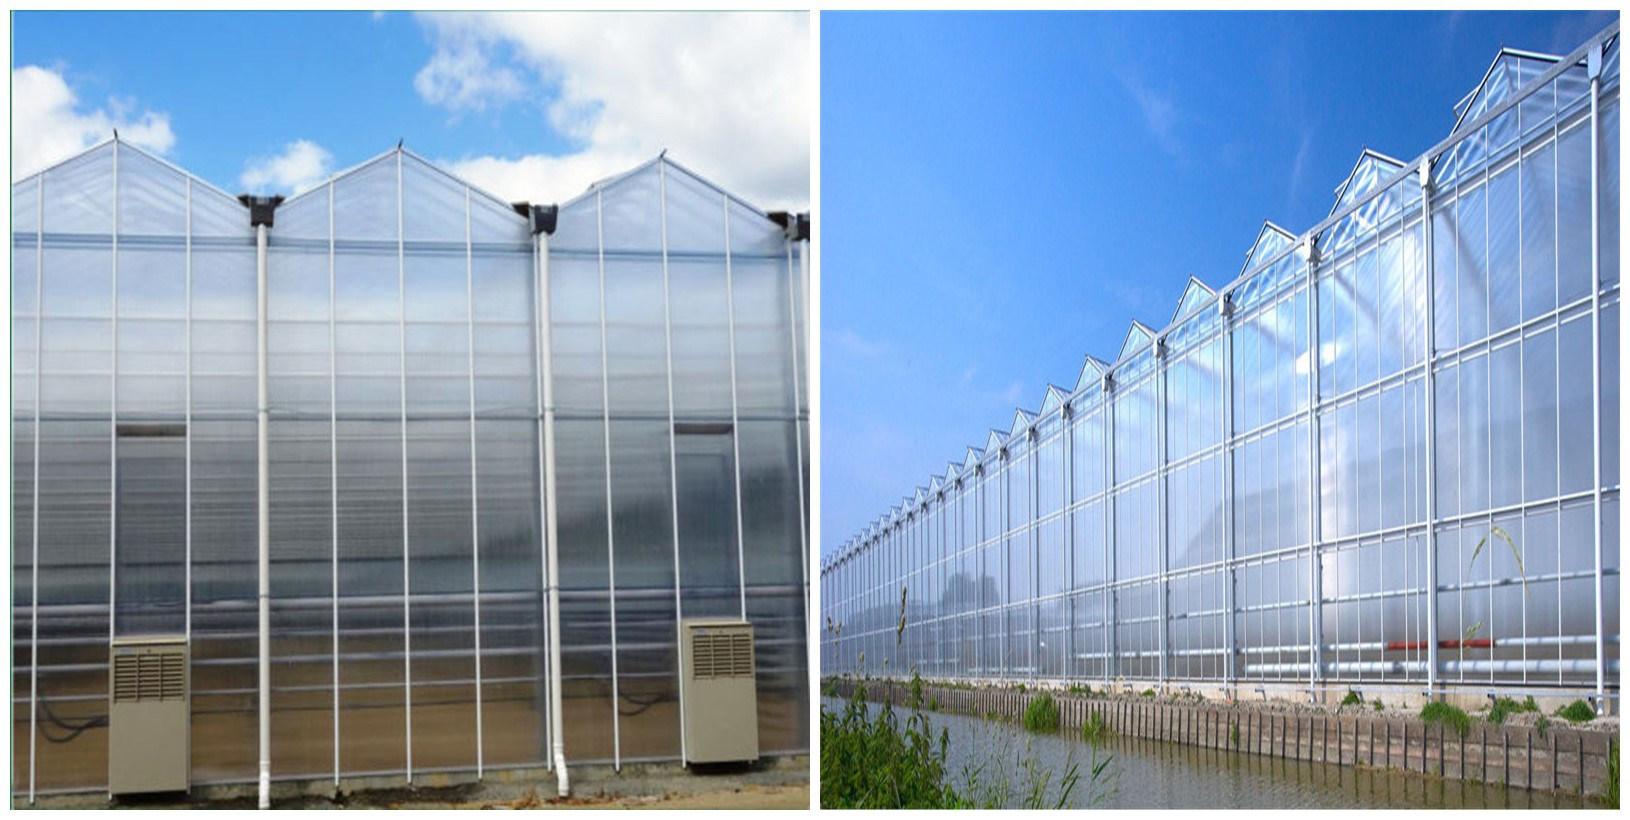 Agriculture Productive Multi-Span Plastic Film Greenhouse for Melon/Tomato/Strawberry/Cucumber/Garden Cultivation